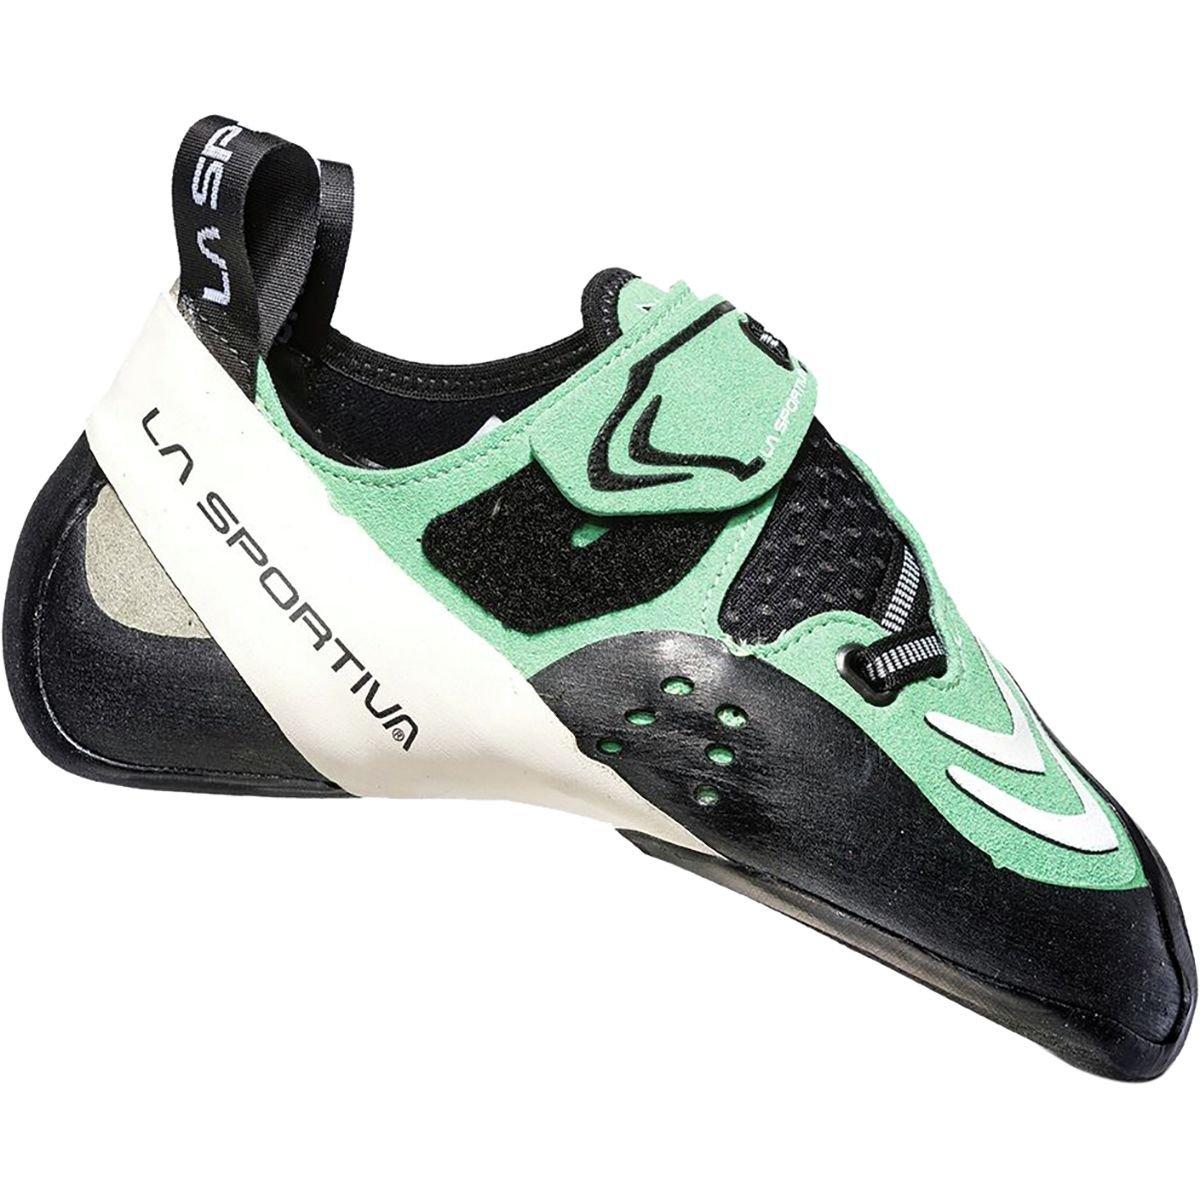 La Sportiva Futura Climbing Shoe - Women's B071G5F414 38.5 M EU|Jade Green/White